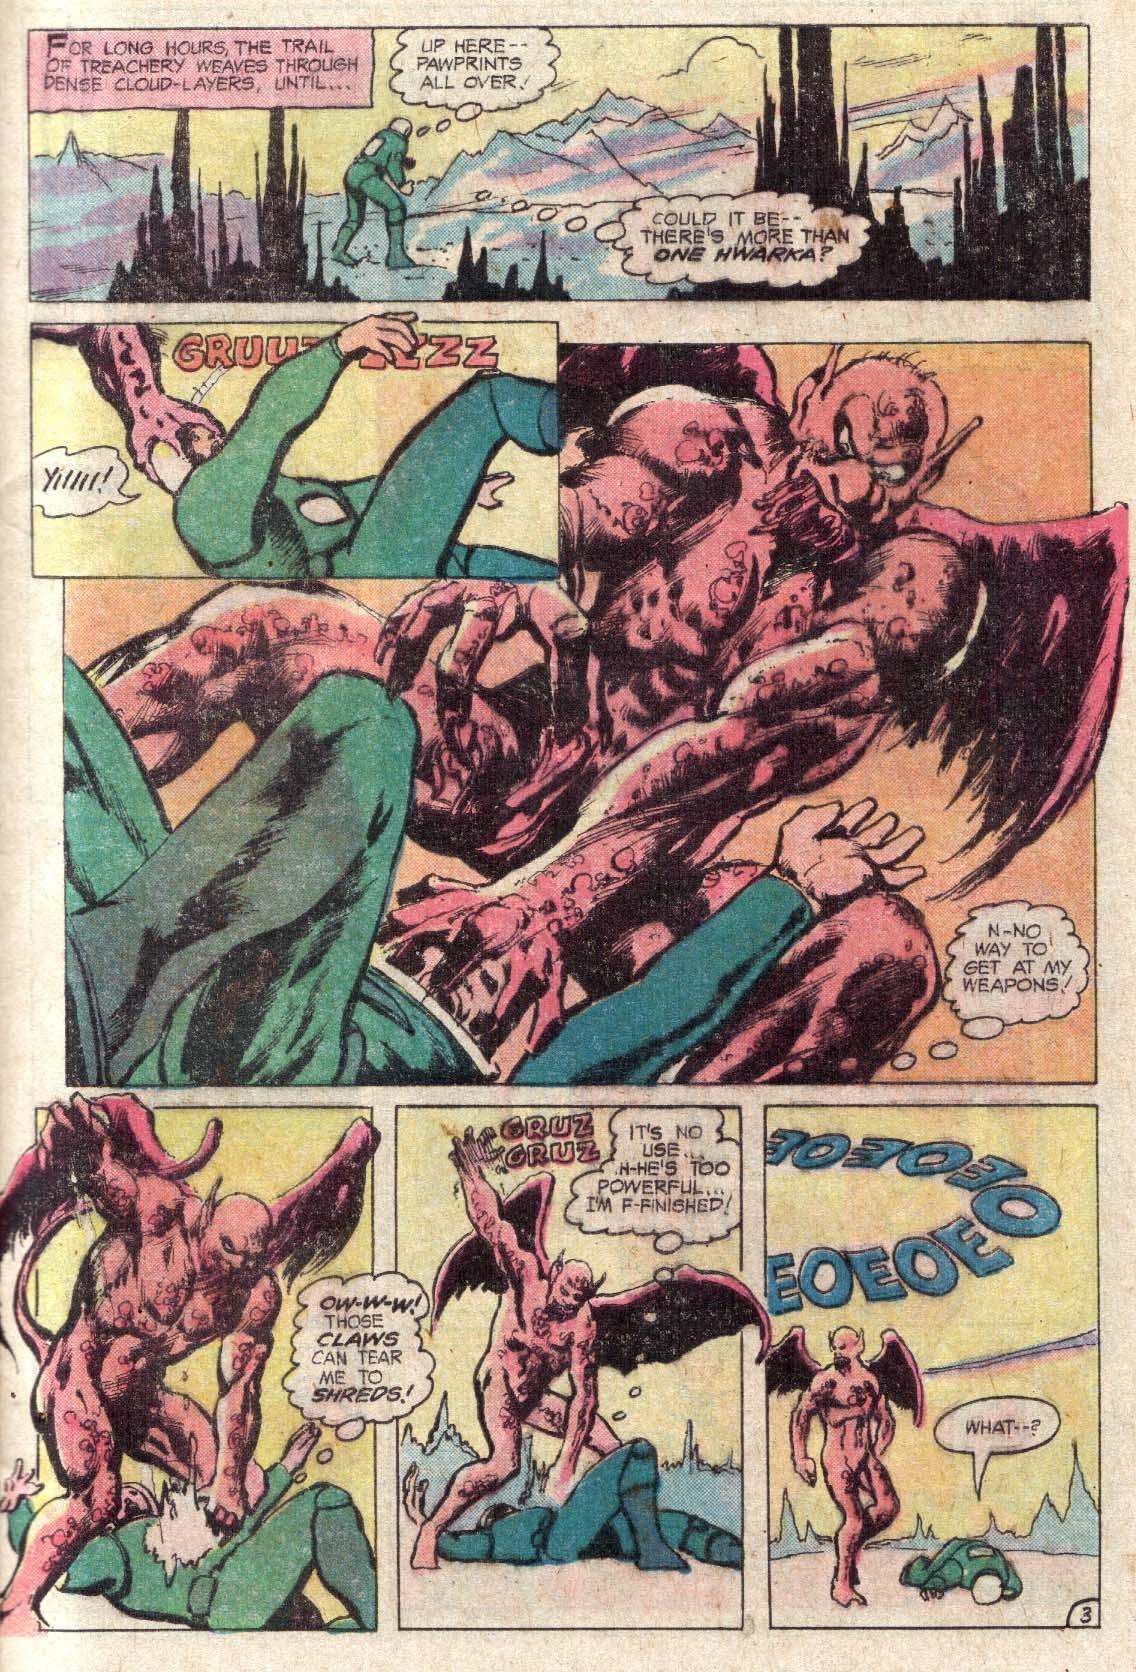 Time Warp (1979) #4 pg.13, art by Mike Nasser.